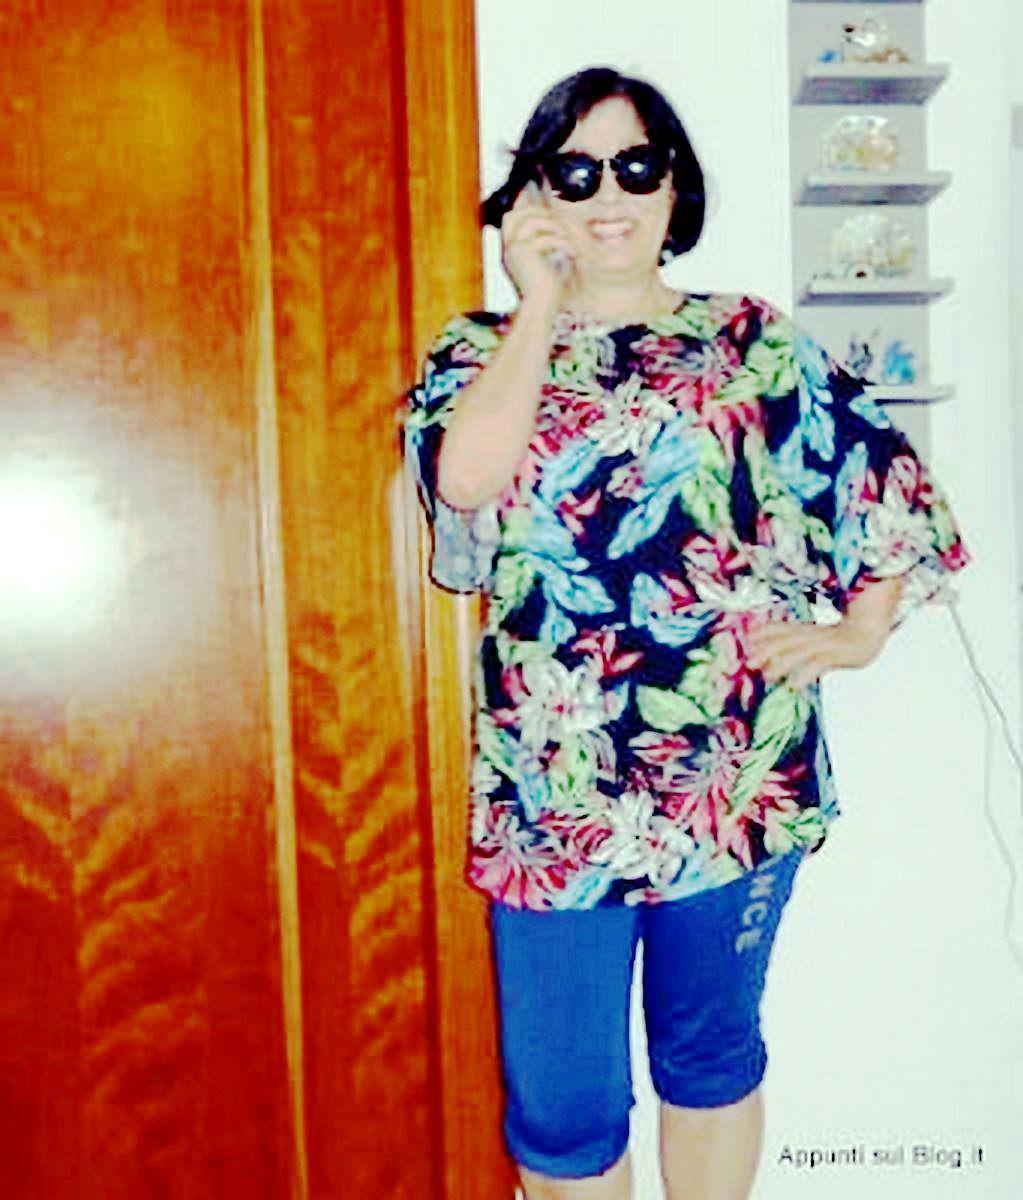 WalkTrendy, mini abito vintage per serate eleganti